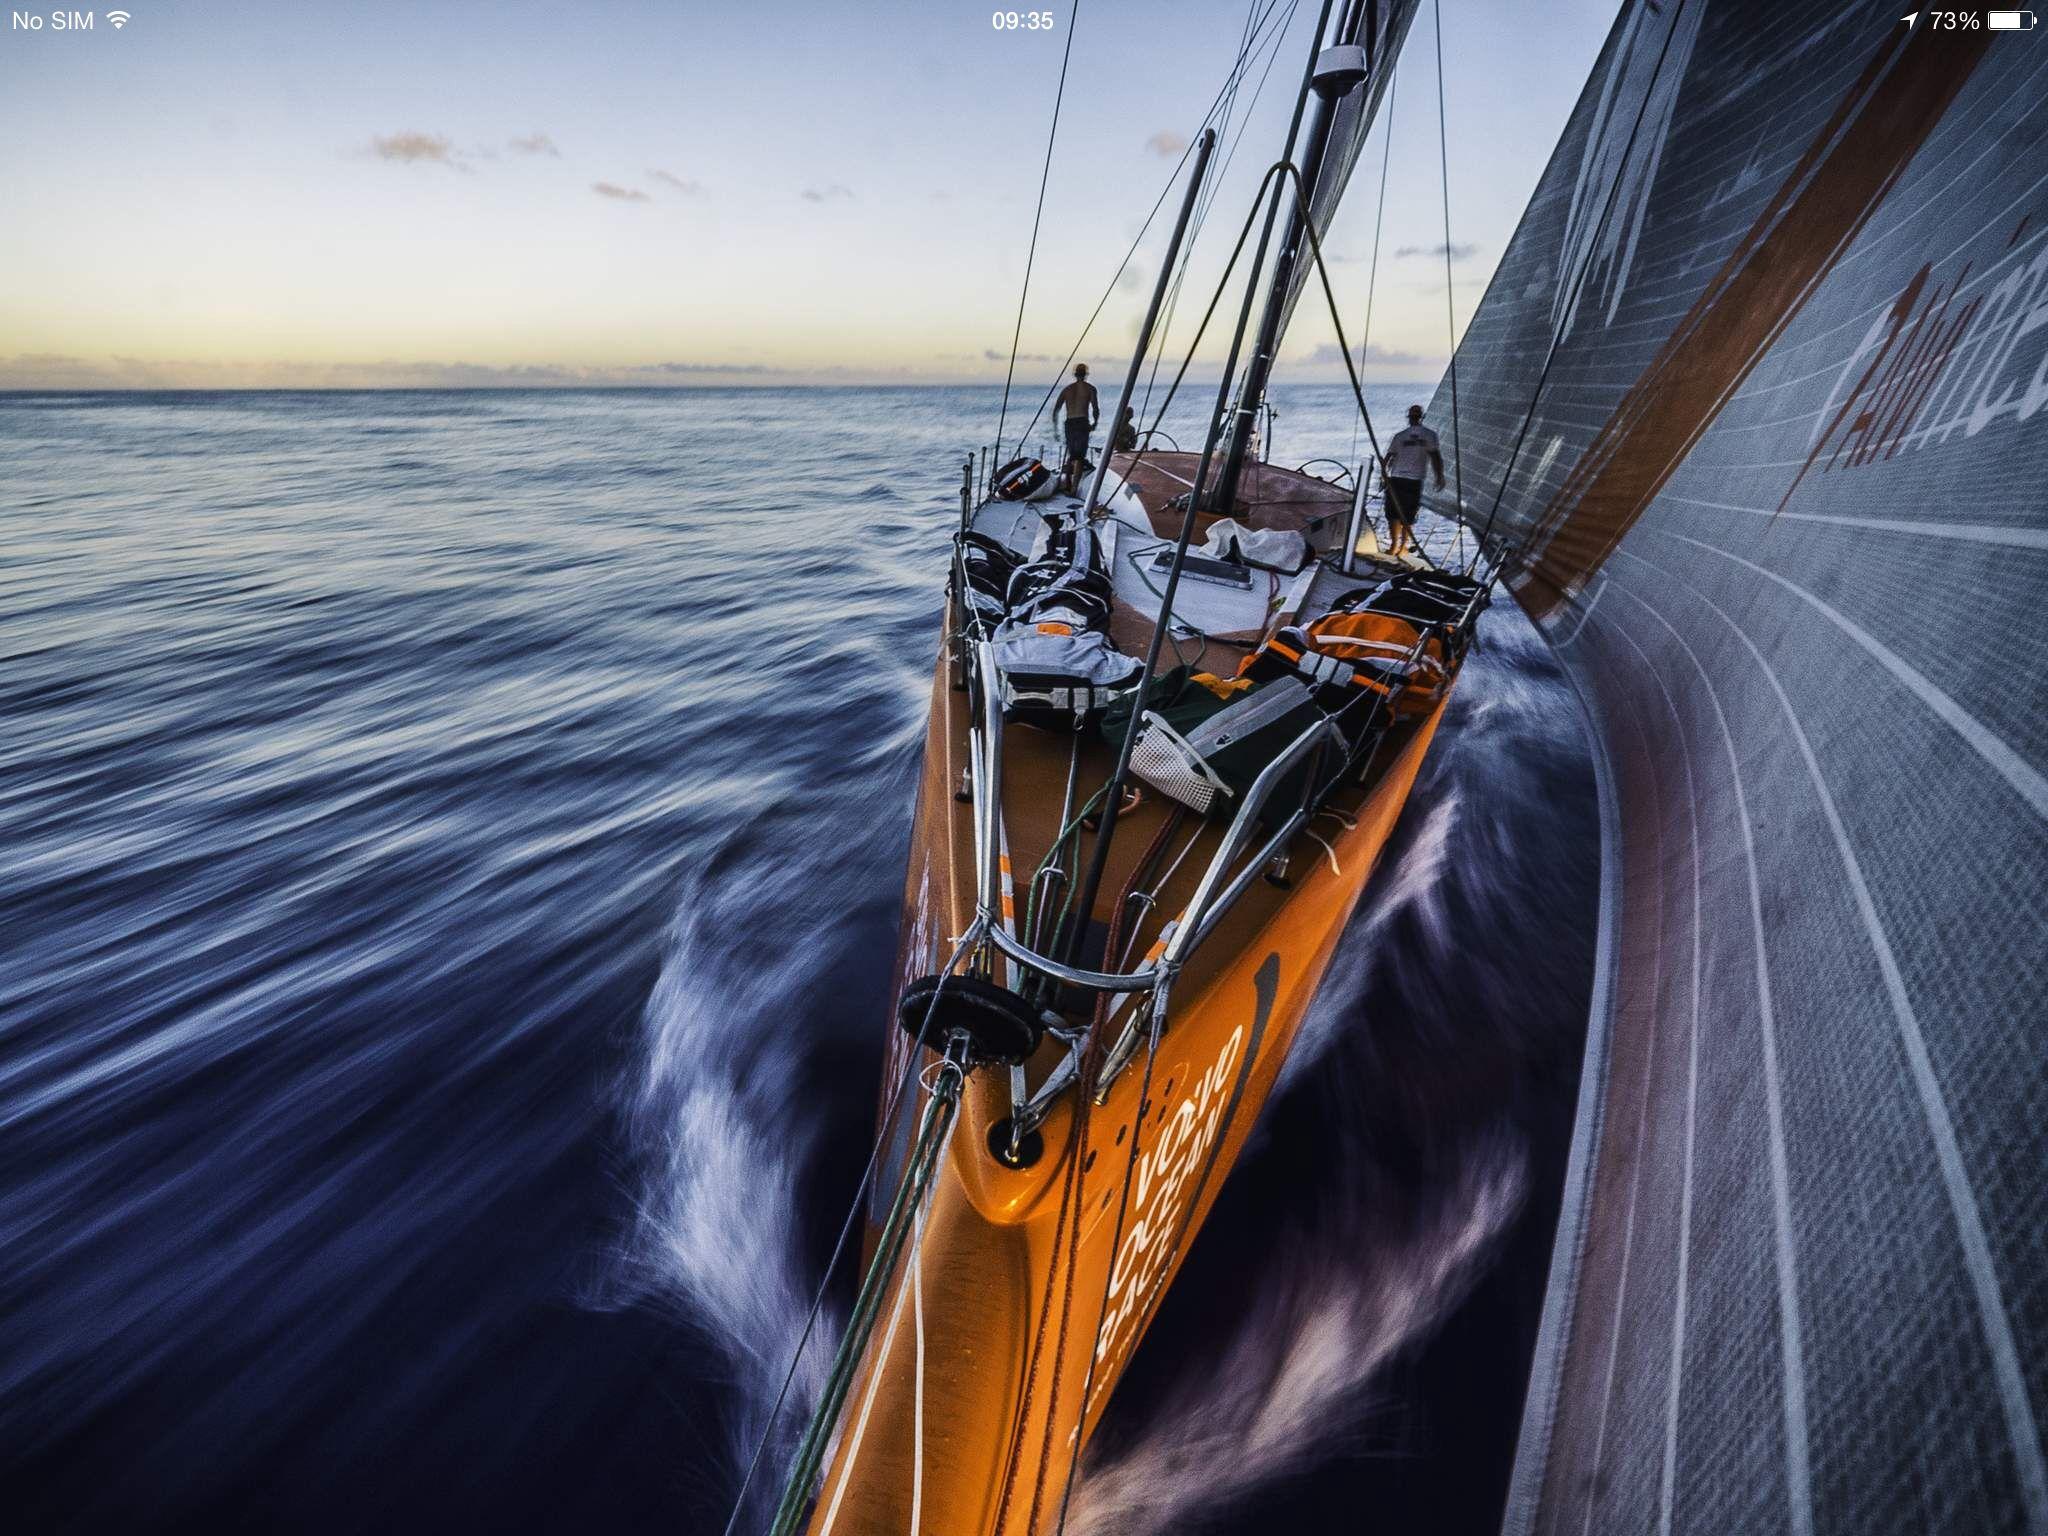 Team Alvimedica, Volvo Ocean Race Volvo ocean race